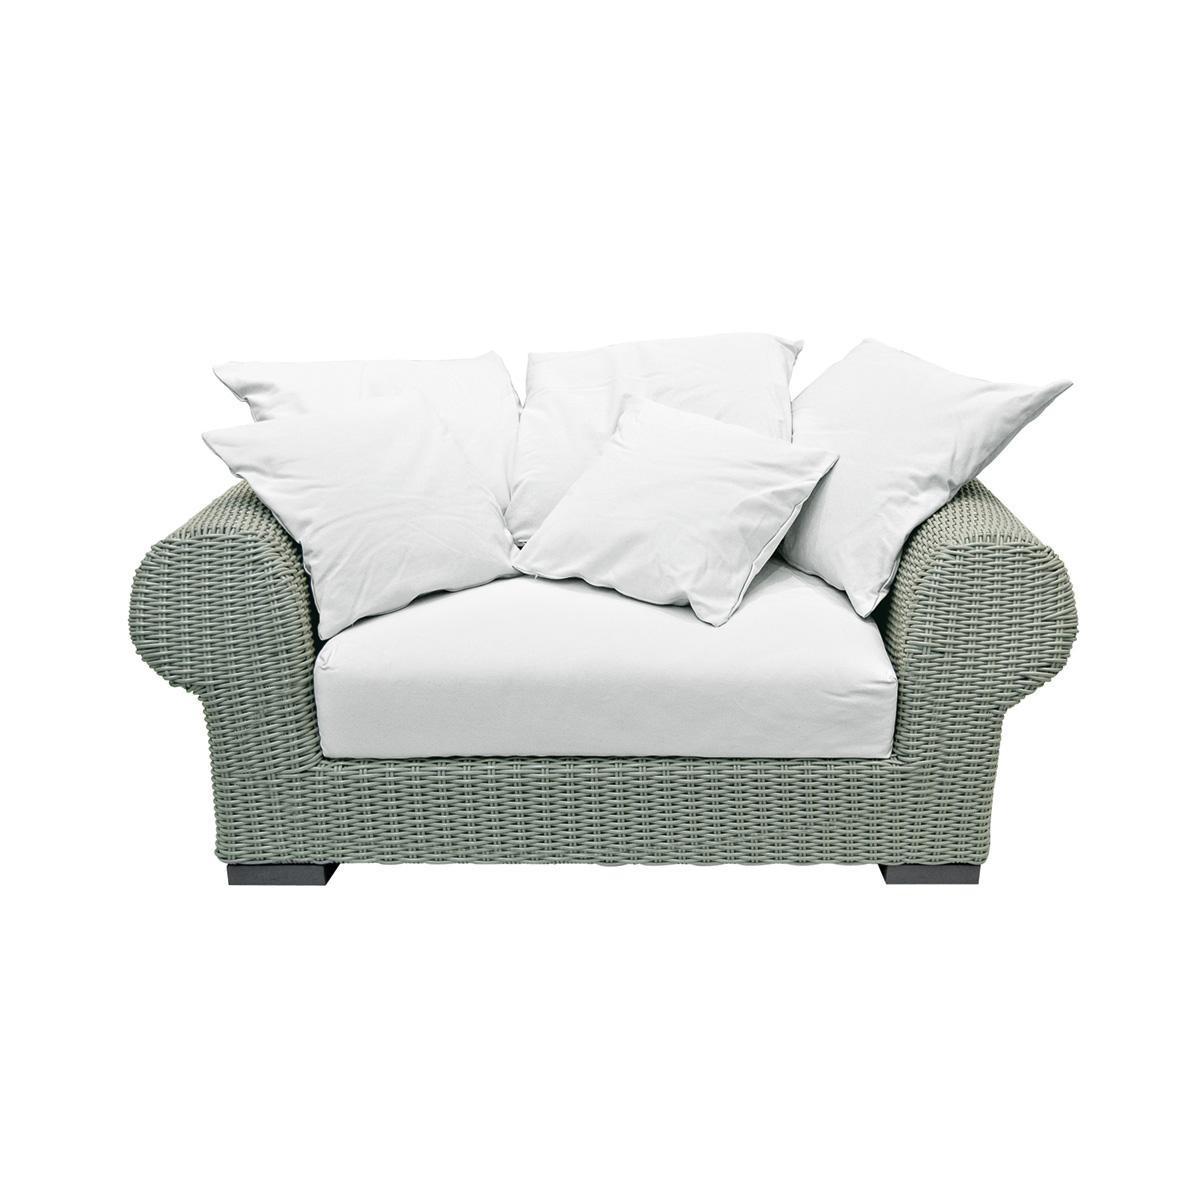 Gervasoni Inout 601 Poly Rattan Outdoor Sofa 166x107 Cm Green Seat Cushion